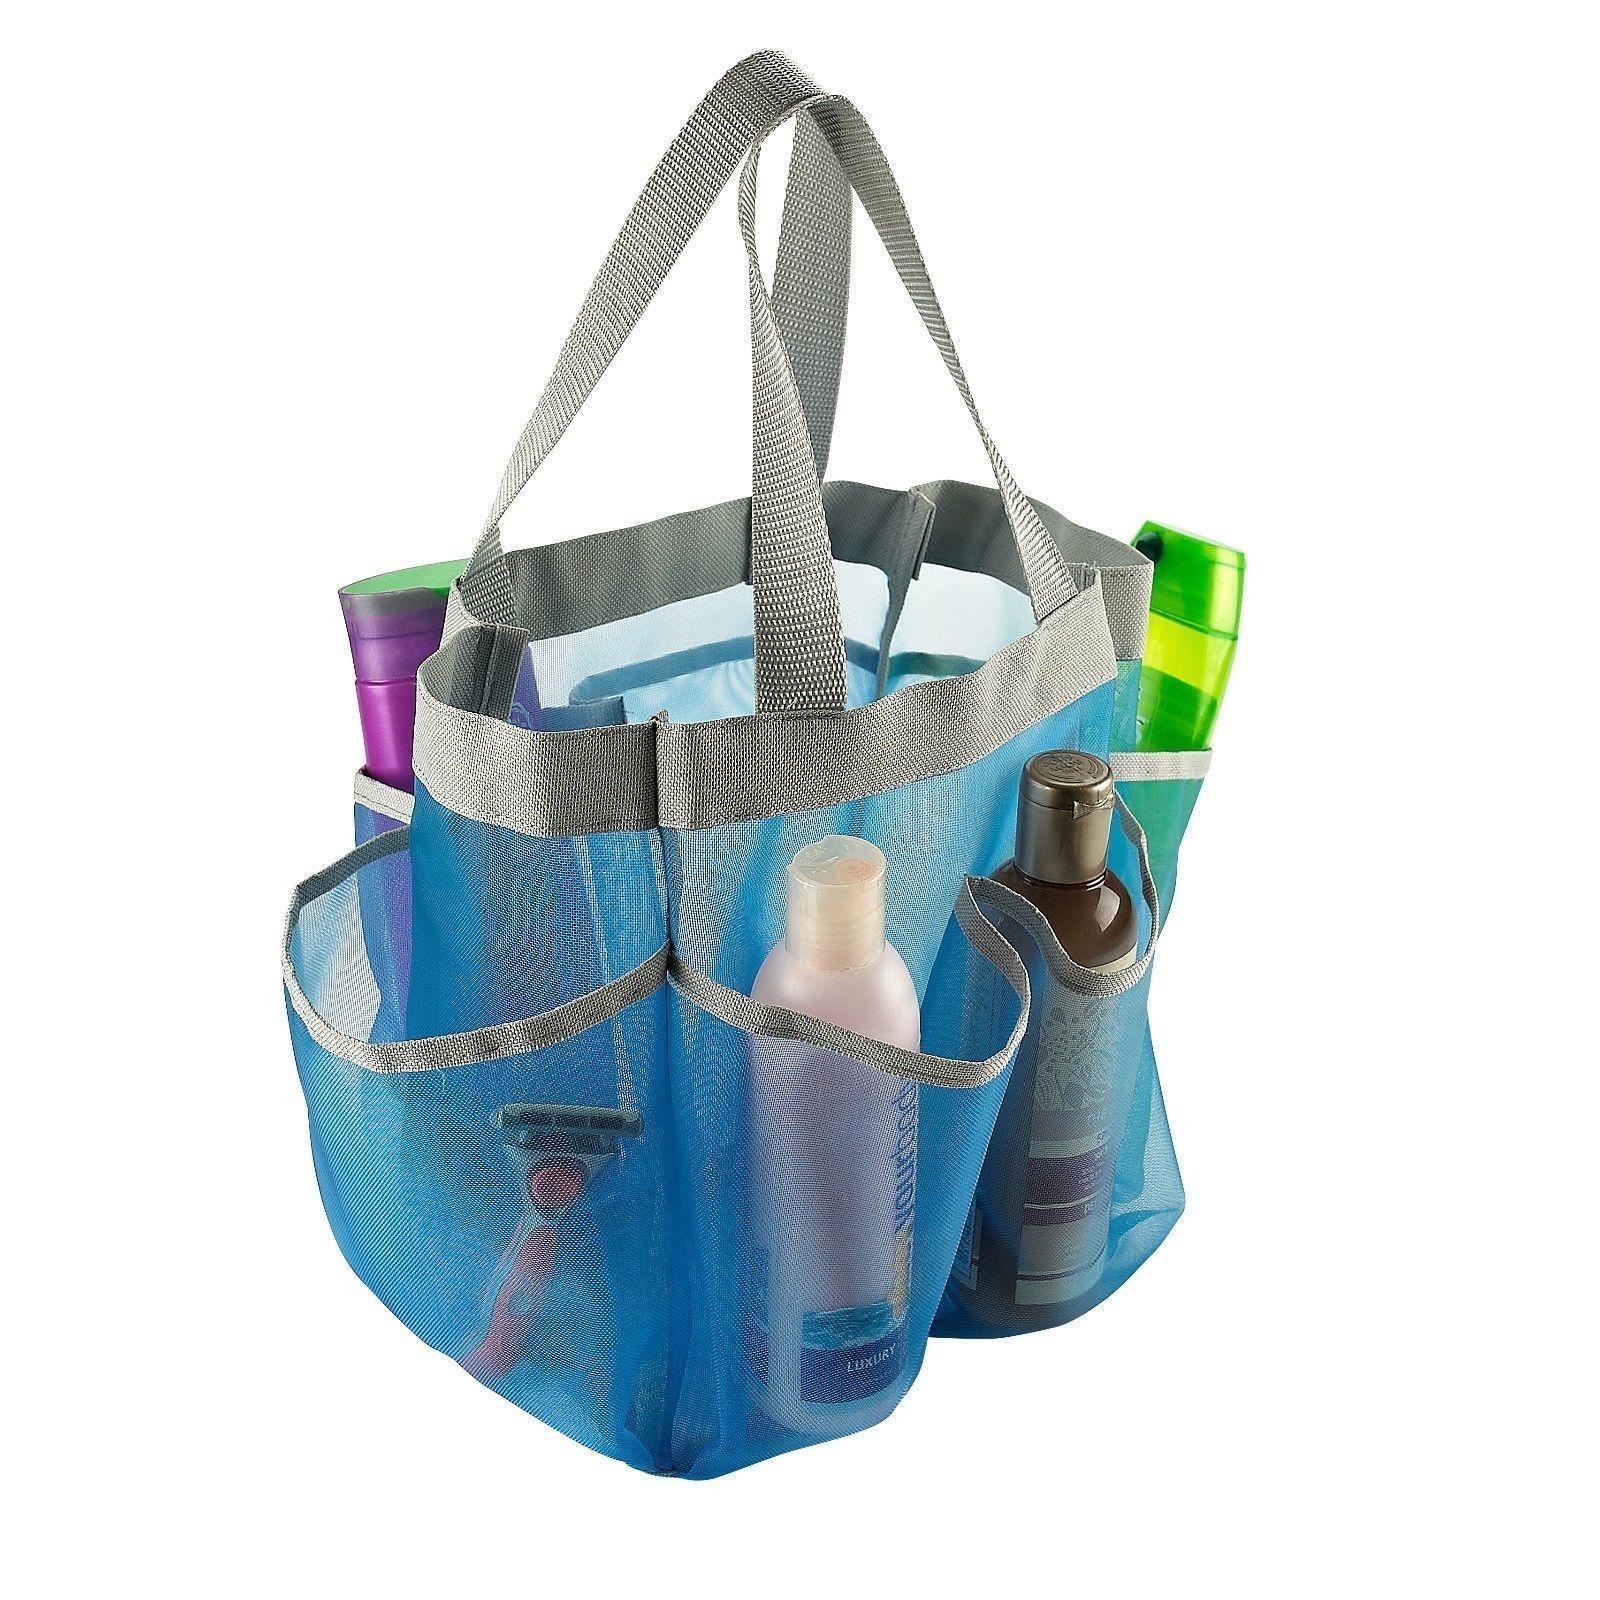 Mesh Shower Caddy Tote Bathroom Organizer, Light Blue, 7 Pocket ...